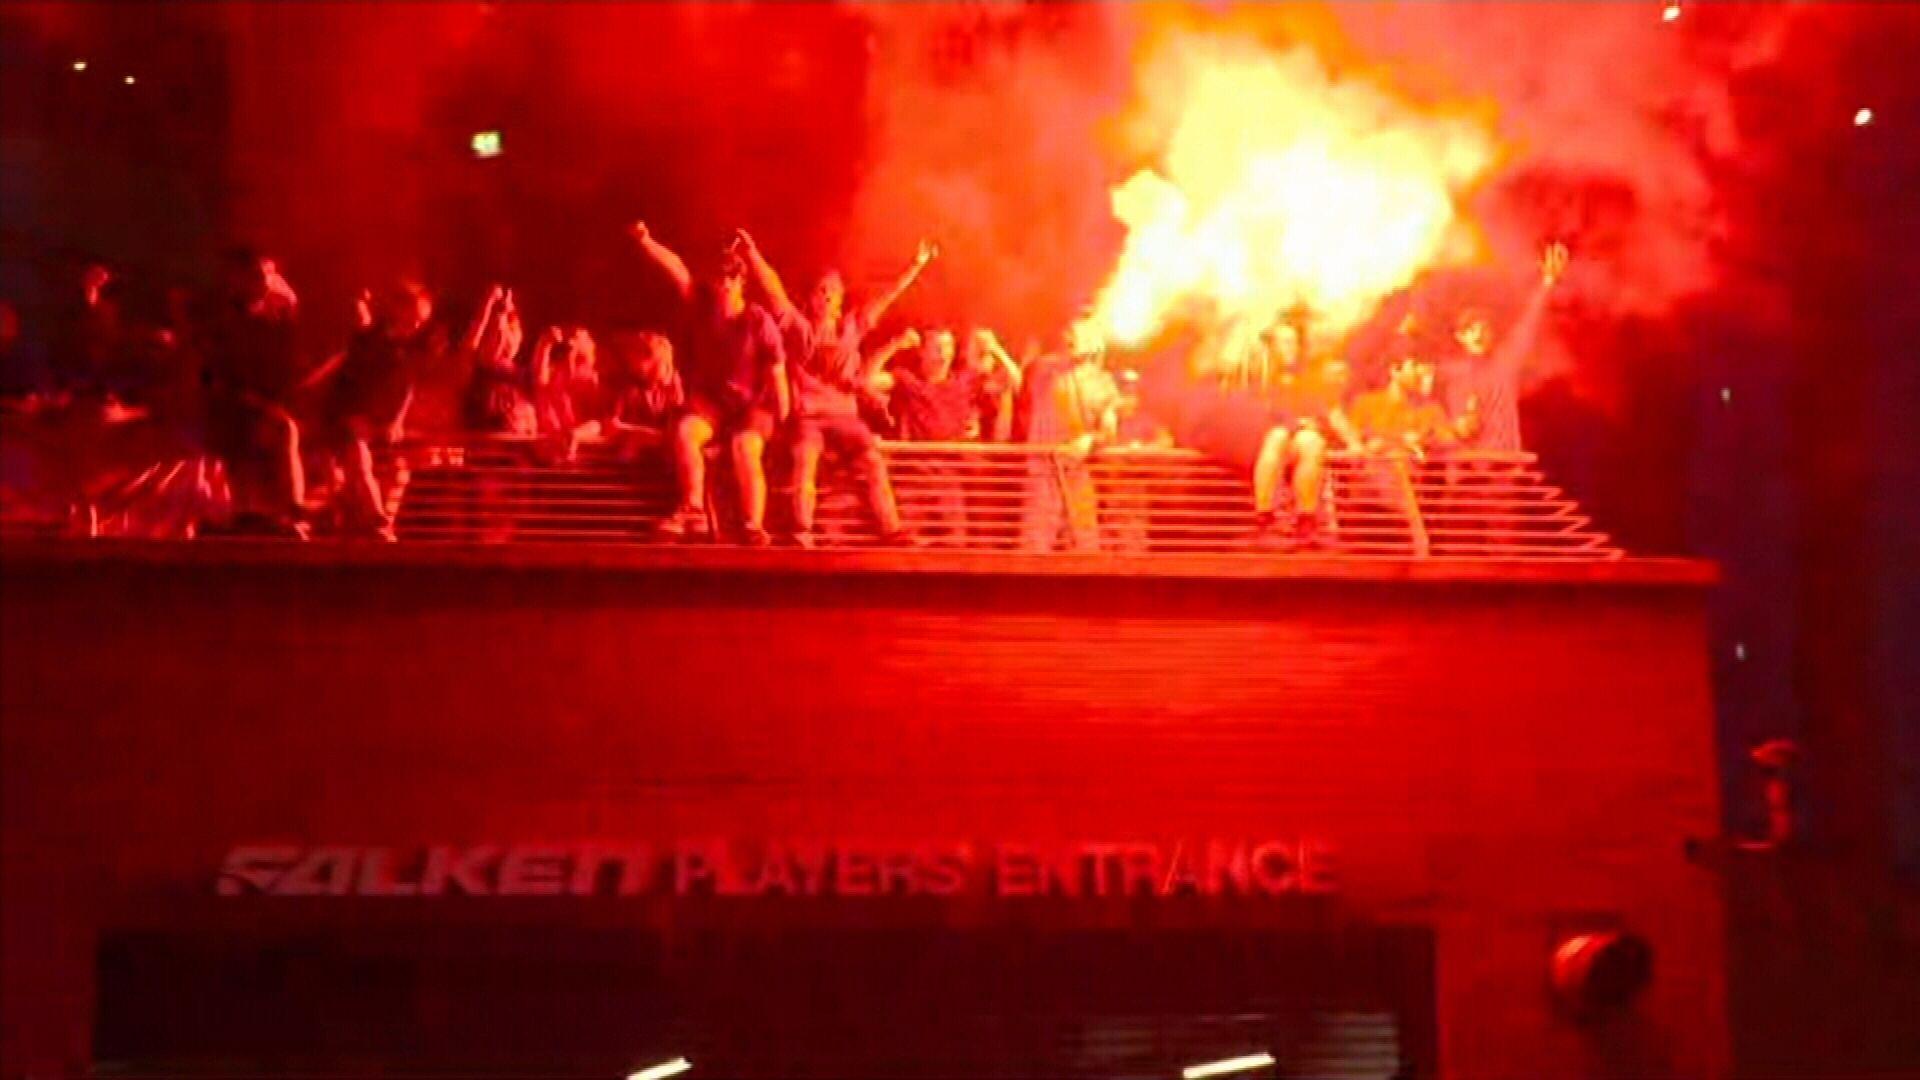 Liverpool breaks 30-year title drought by winning Premier League – Wide World of Sports